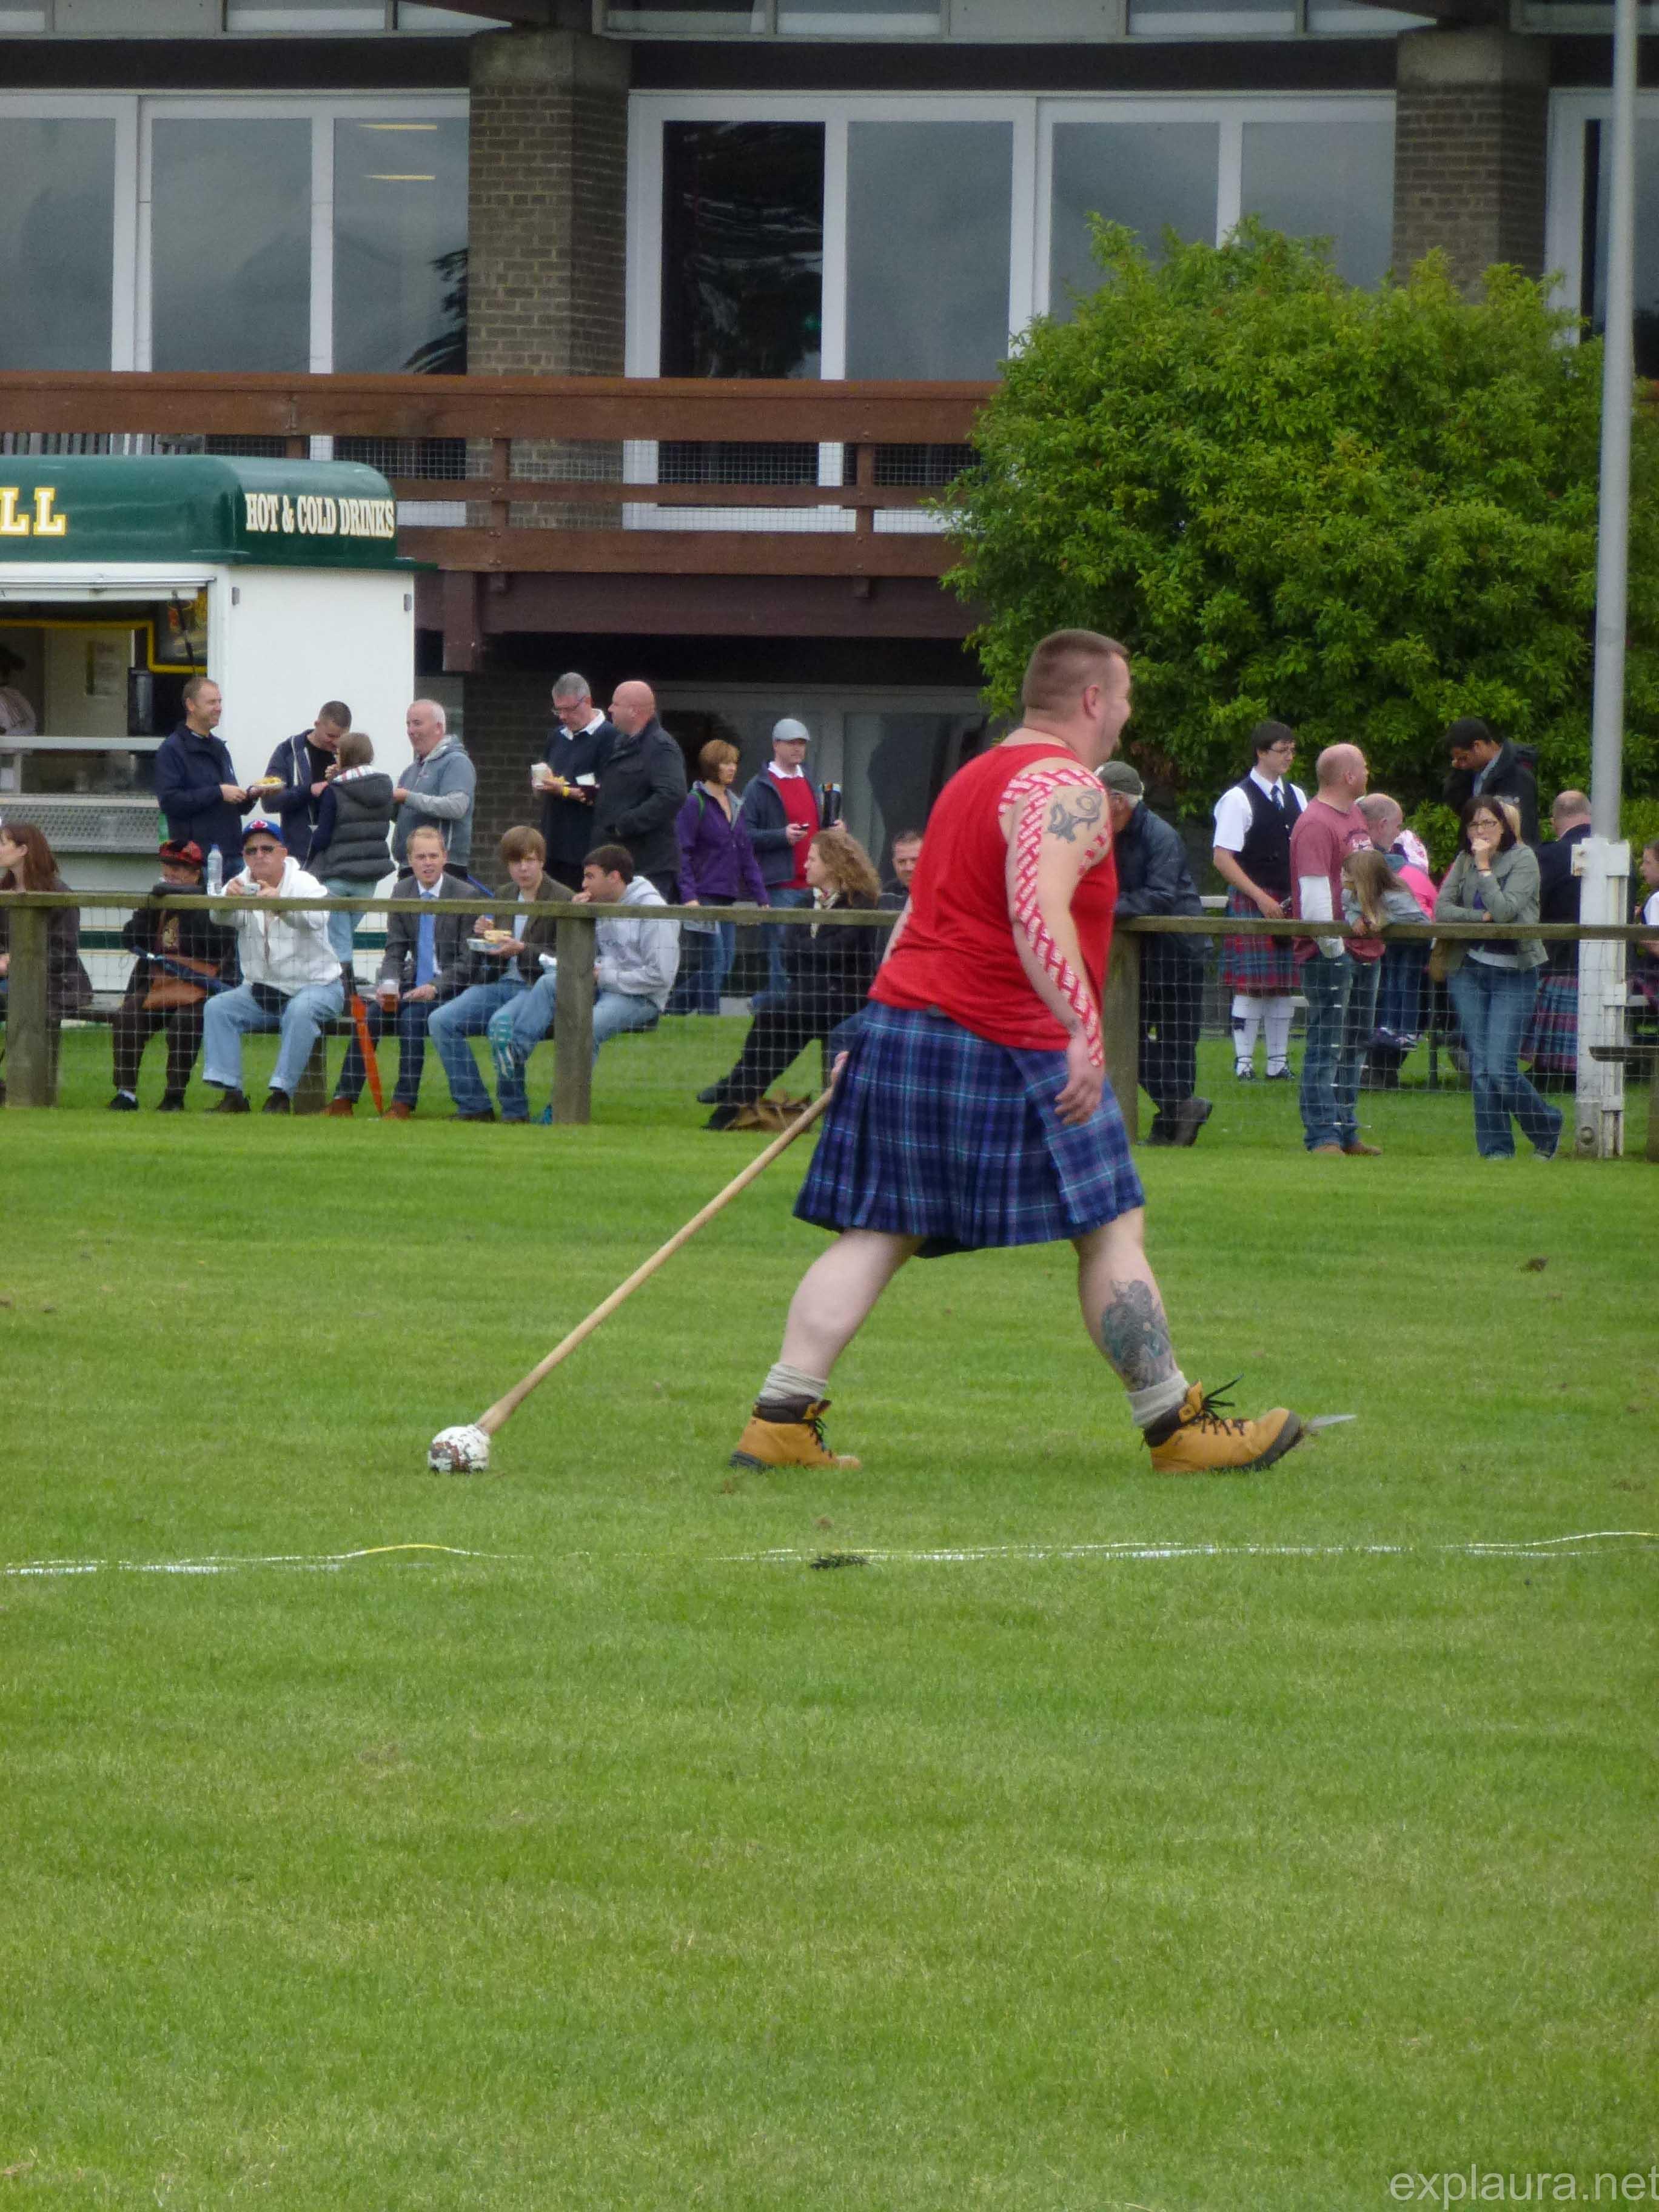 scotland (2 of 4)